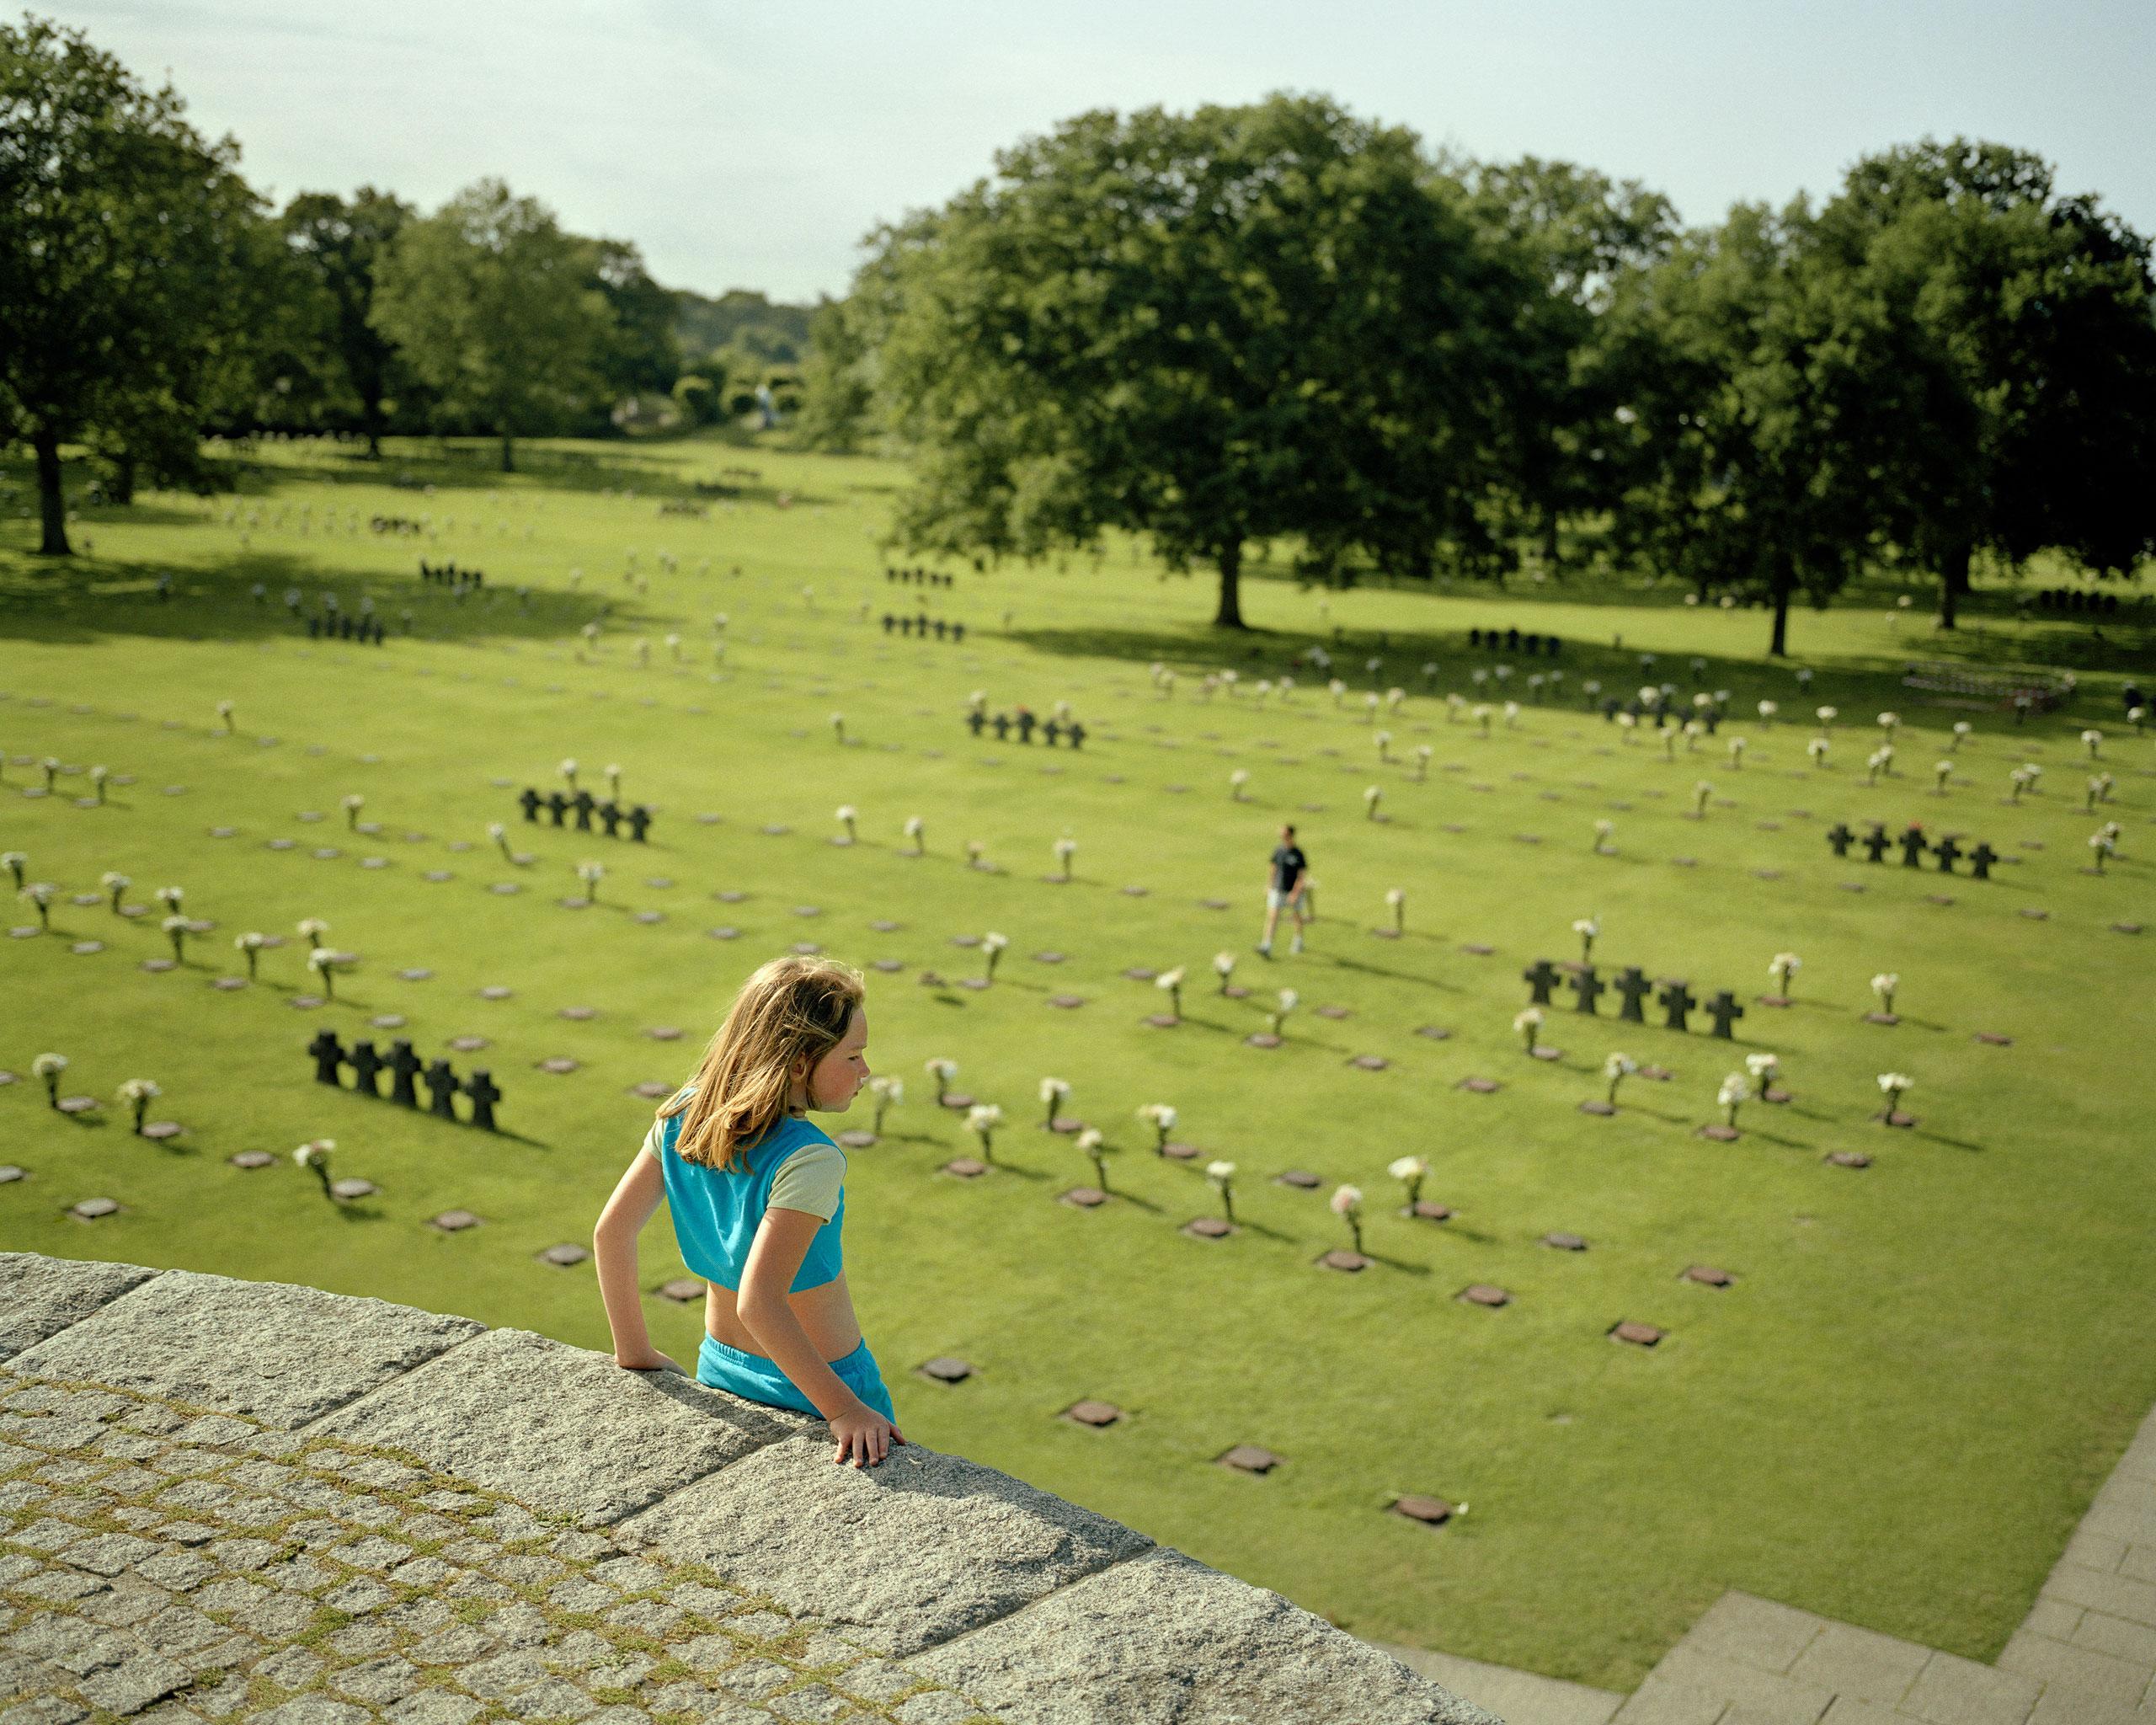 La Cambe, 60th anniversary of D-Day, 2004German military cemetery at La Cambe.